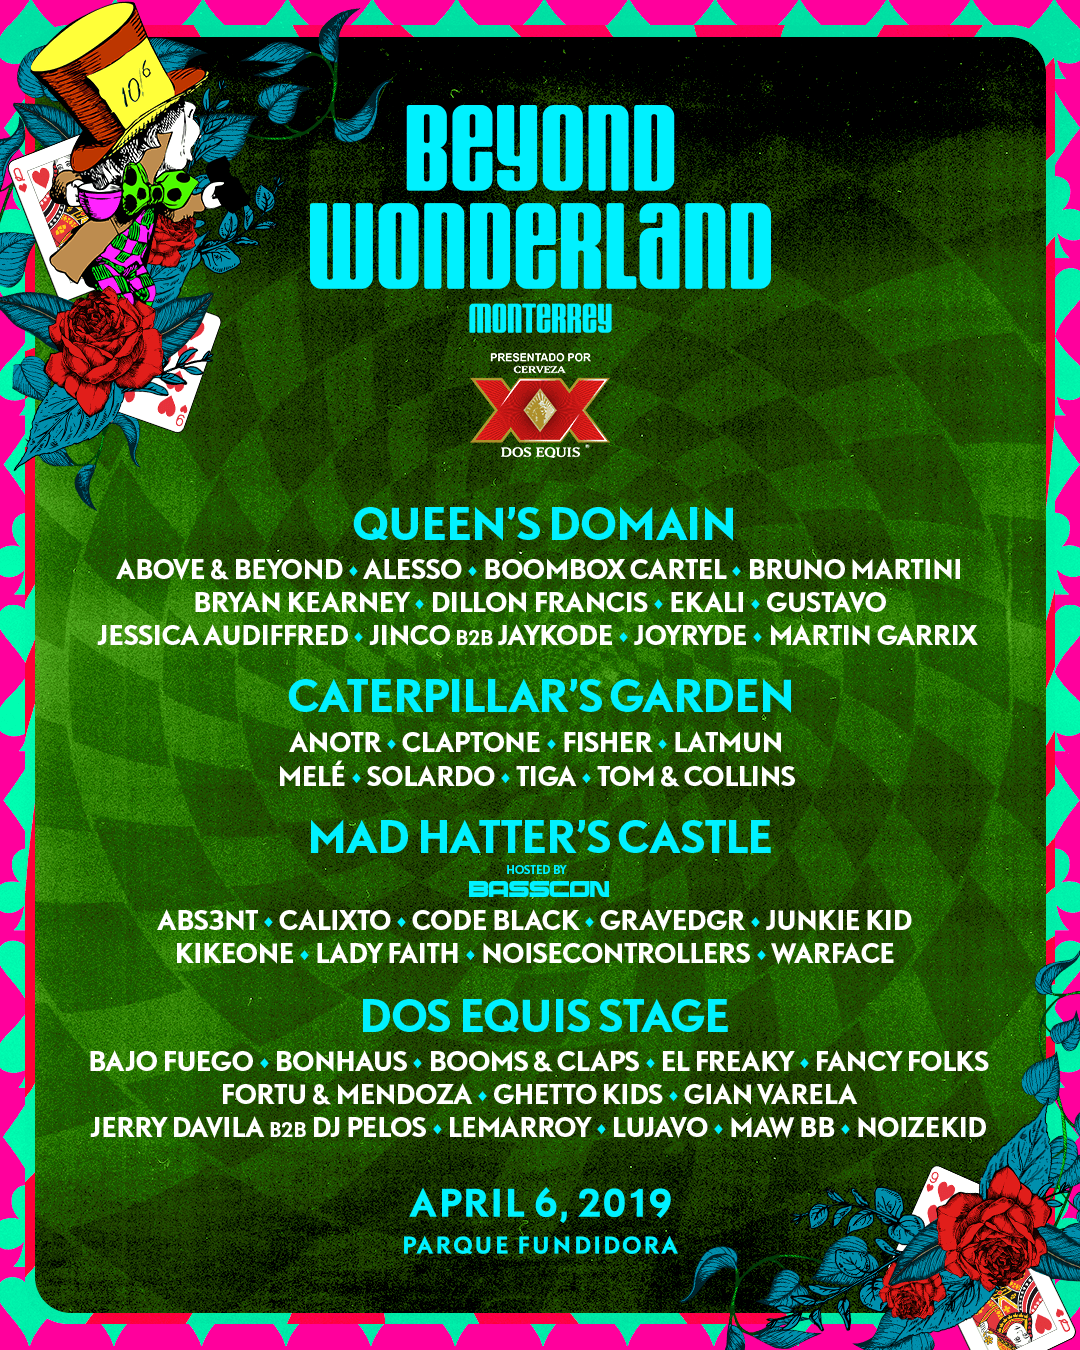 Beyond Monterrey 2019 lineup